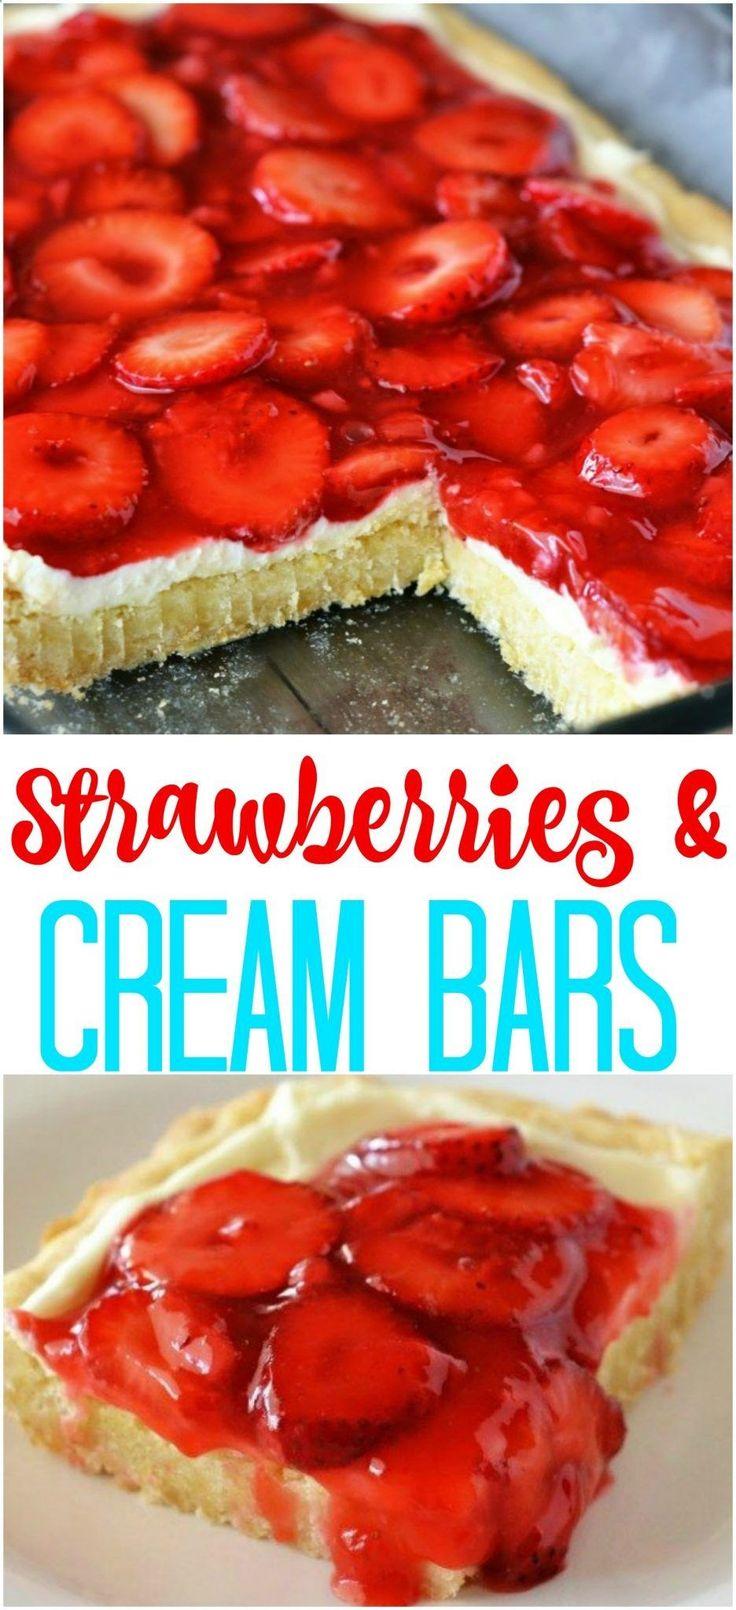 Strawberries and Cream Dessert Bars recipe - cookie bar crust, cream cheese and fresh strawberry topping